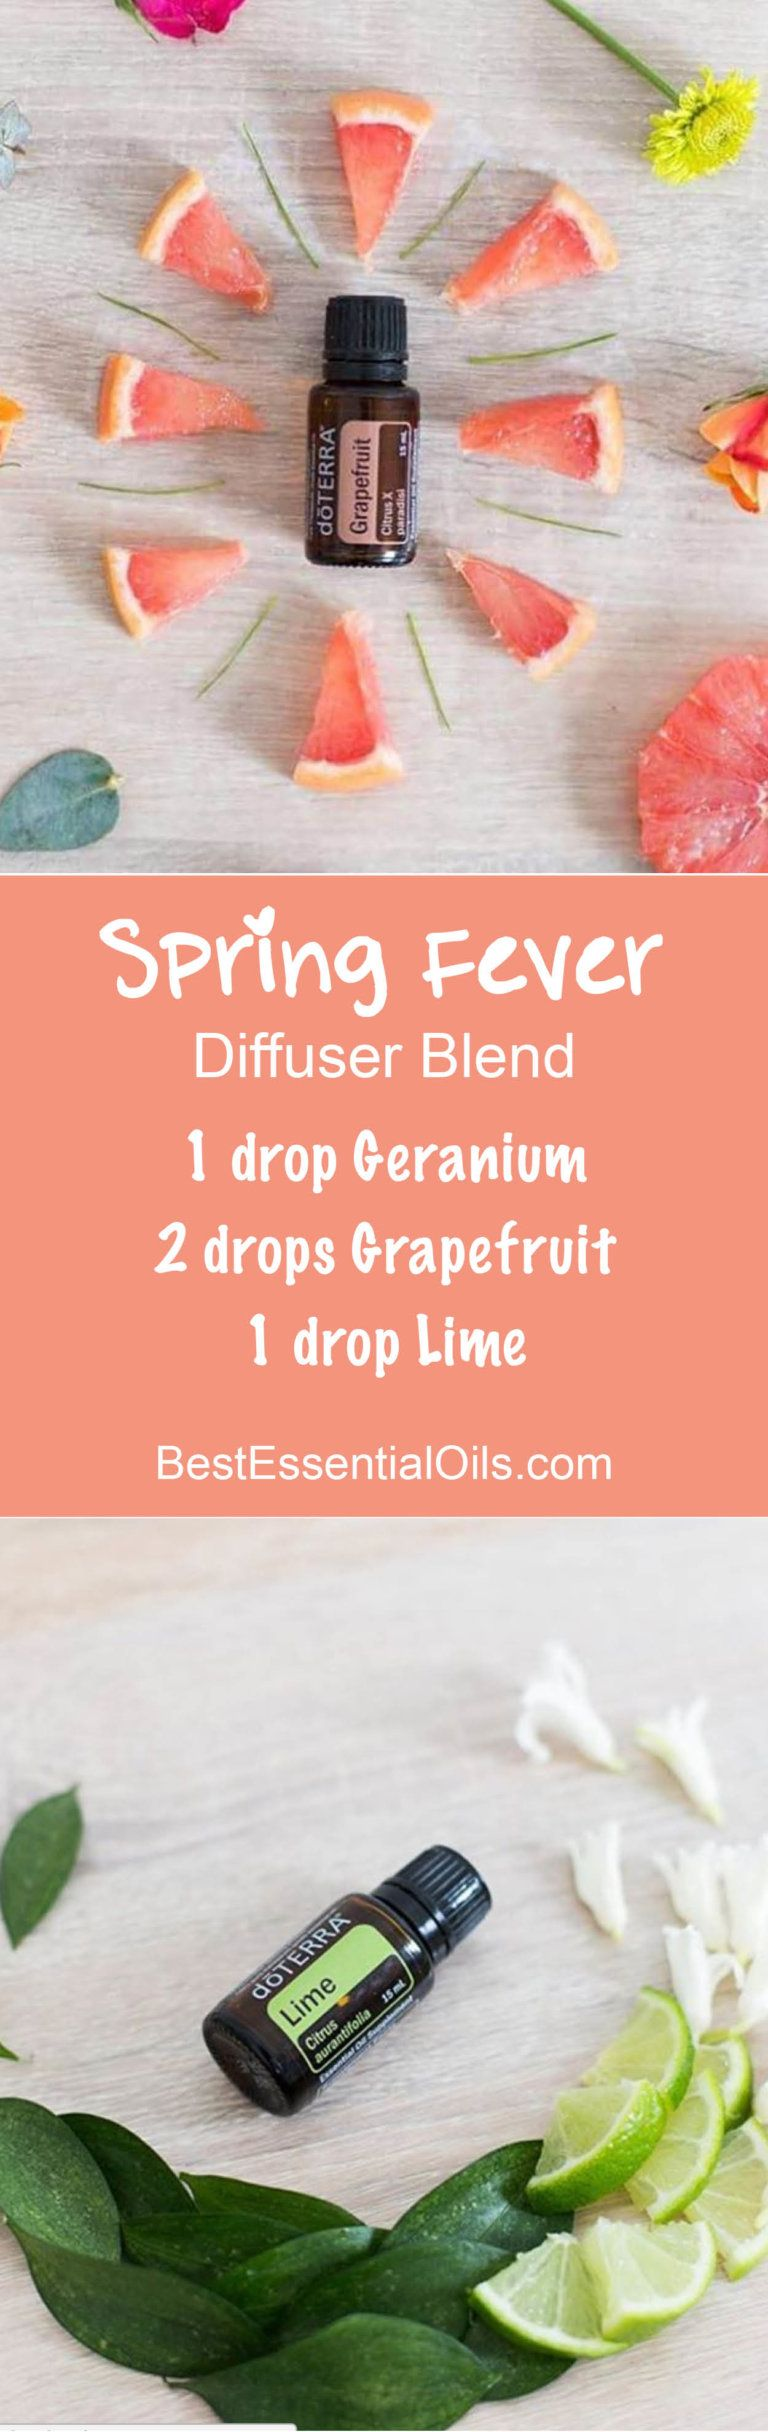 Spring Fever doTERRA Diffuser Blend